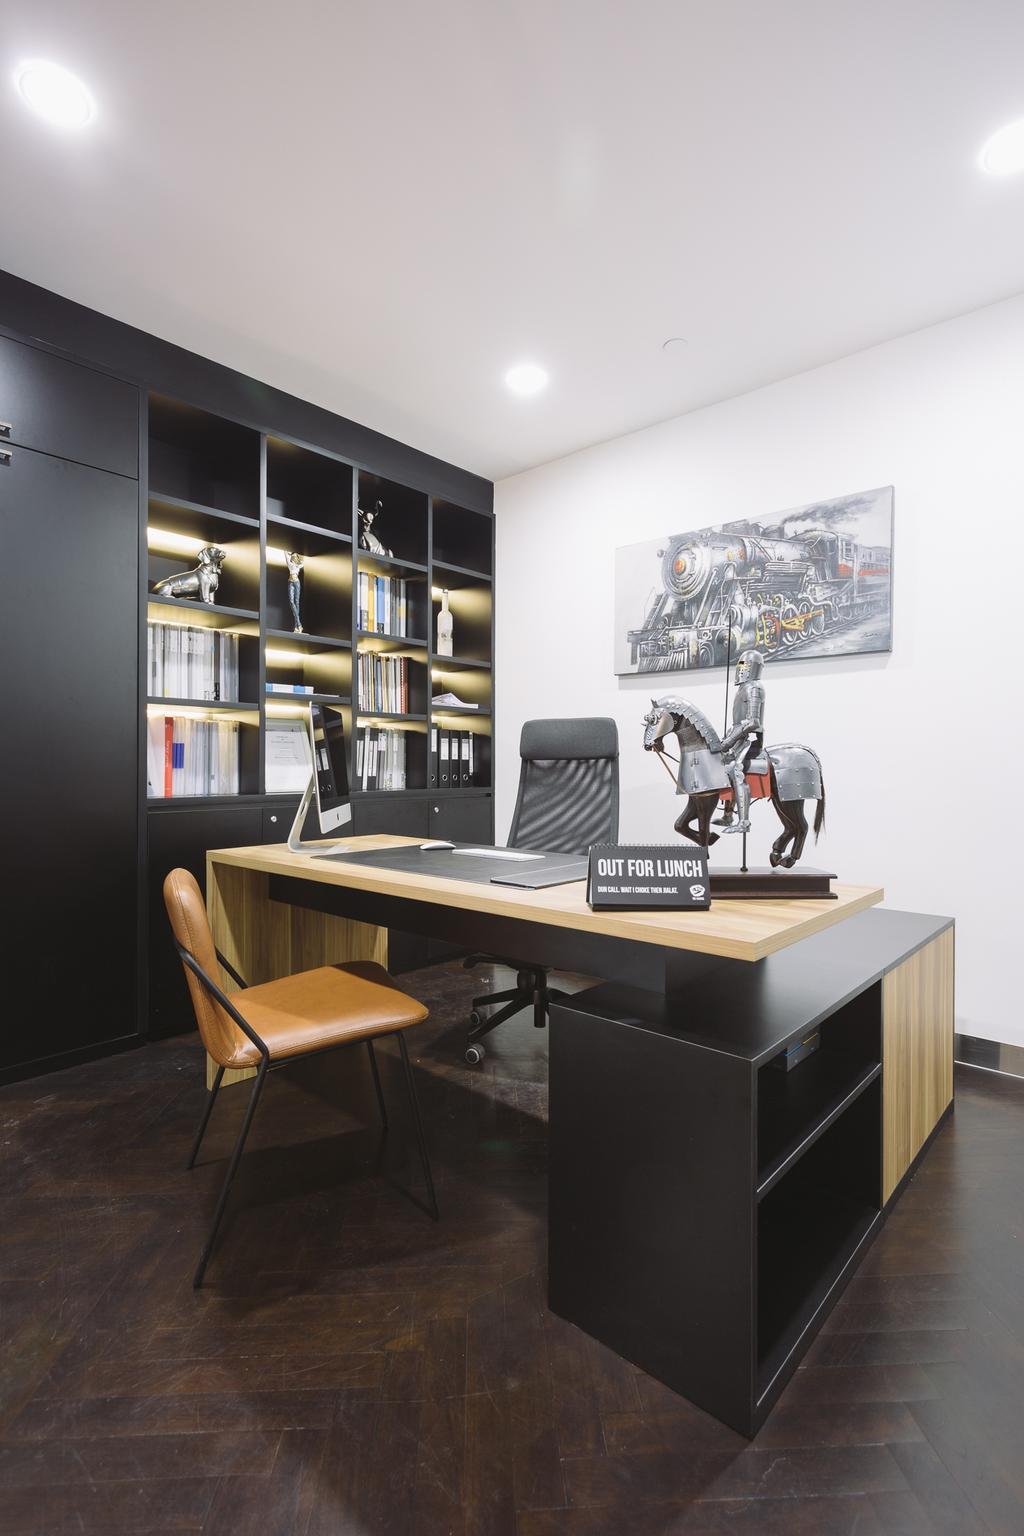 Schemacraft Showroom, Commercial, Interior Designer, Schemacraft, Contemporary, Living Room, Chair, Furniture, Desk, Table, Sink